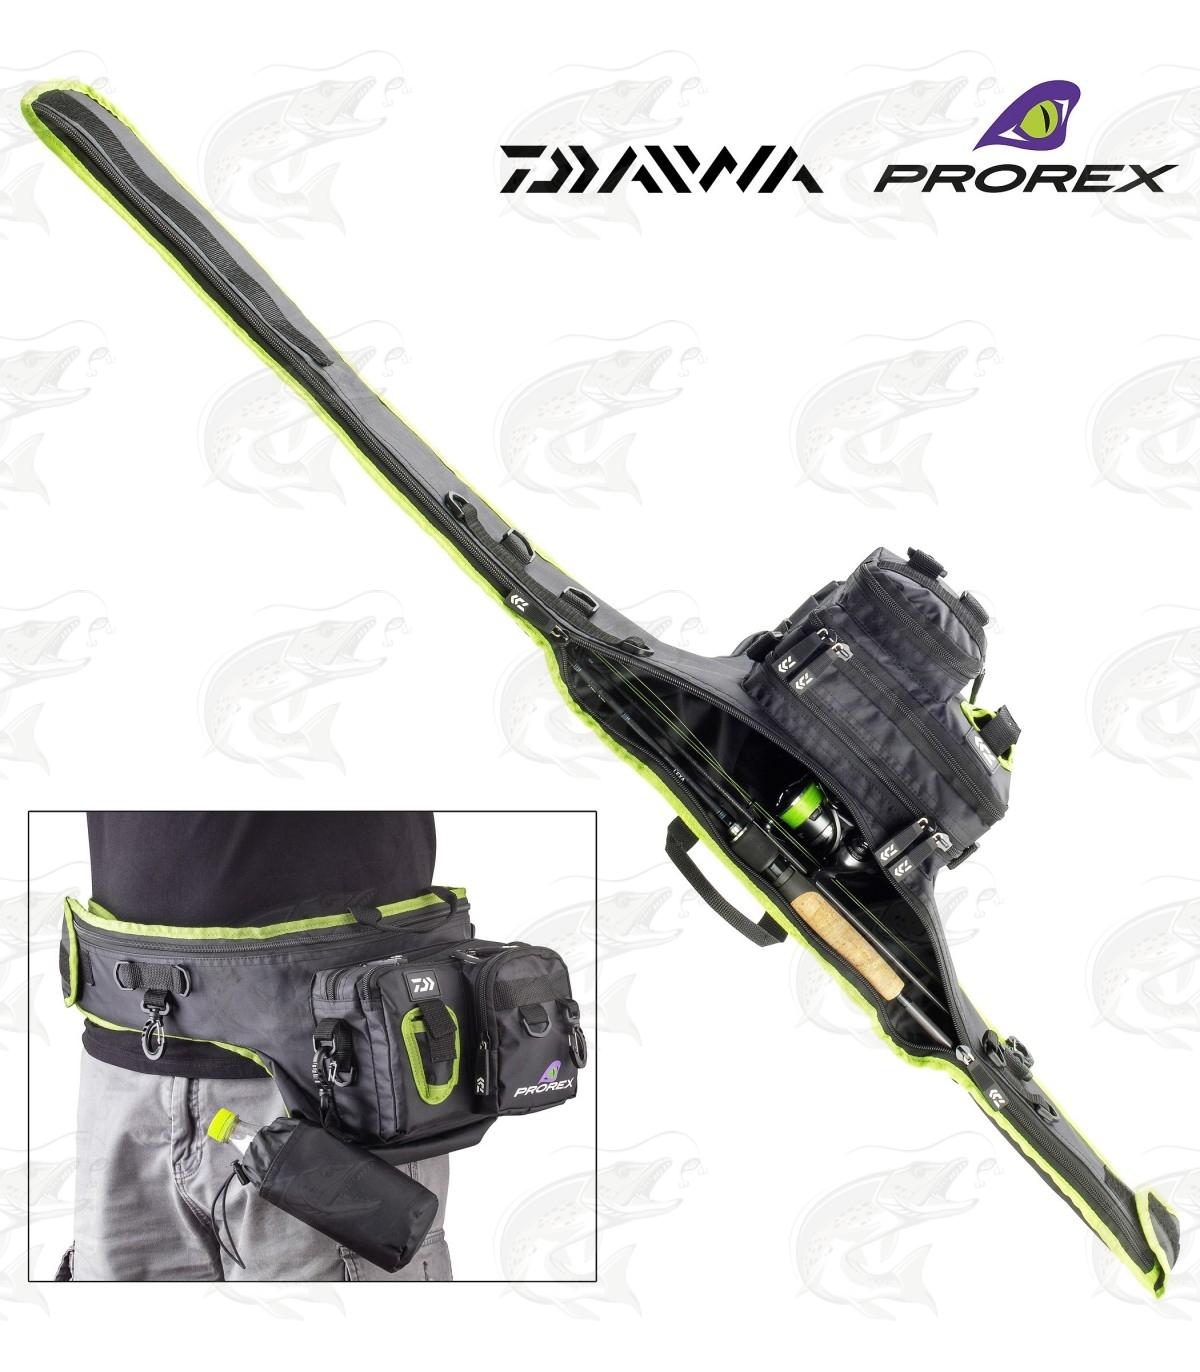 Chartreuse Black New Daiwa Prorex Rod Sleeve Choice of Sizes